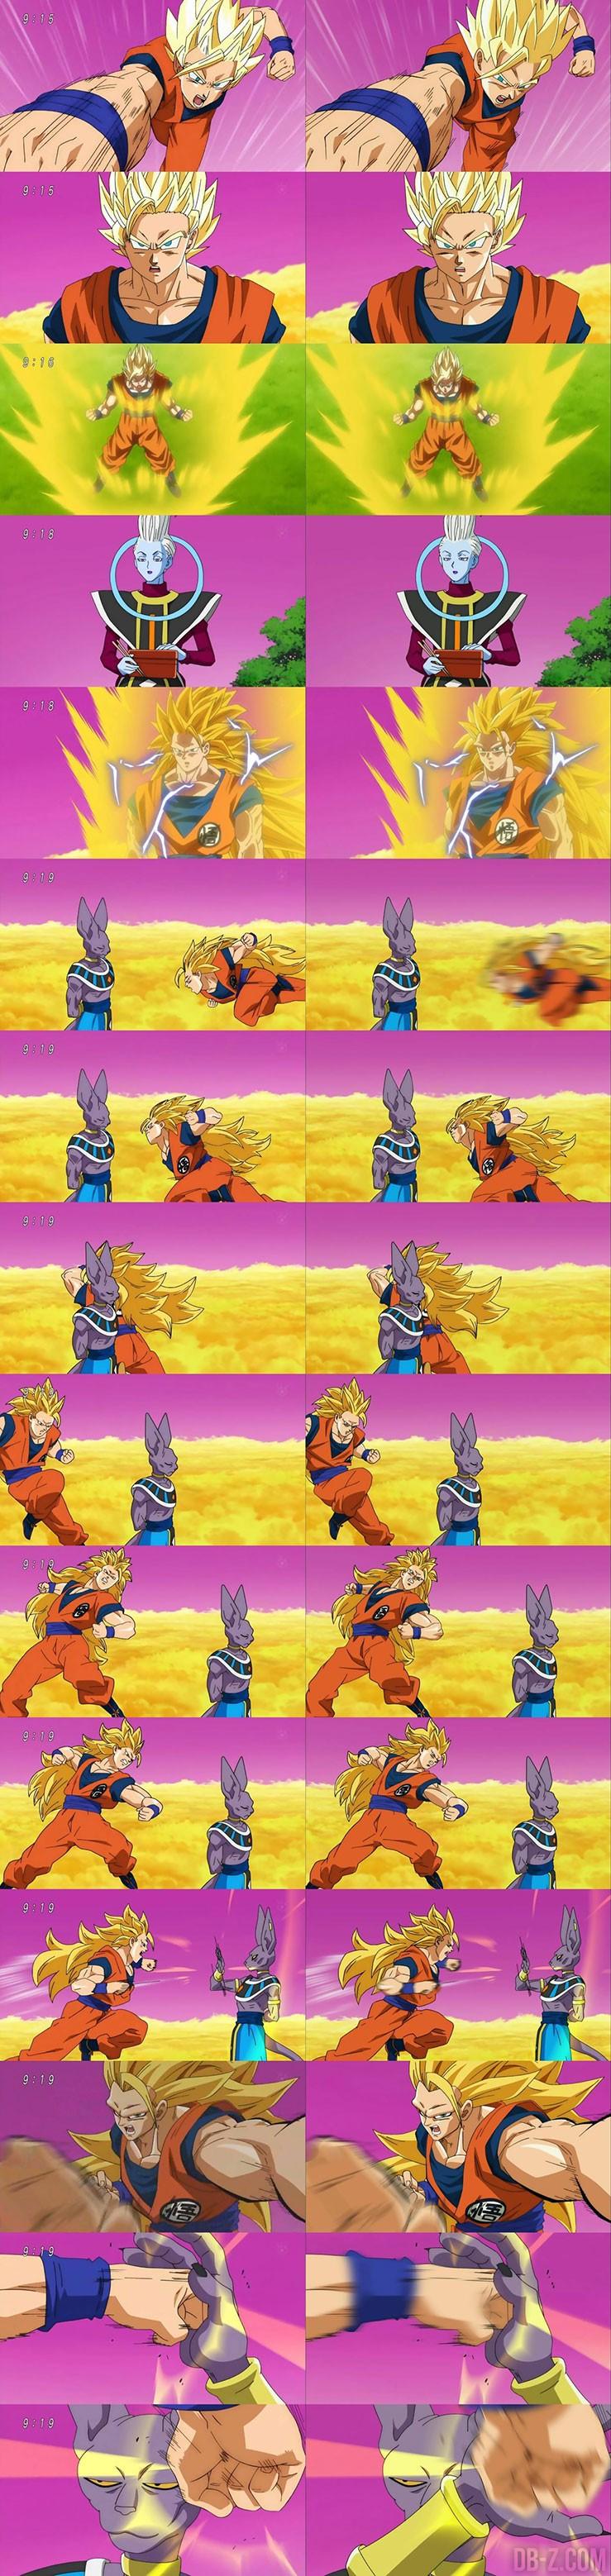 Dragon-Ball-Super-Episode-5-v2-c